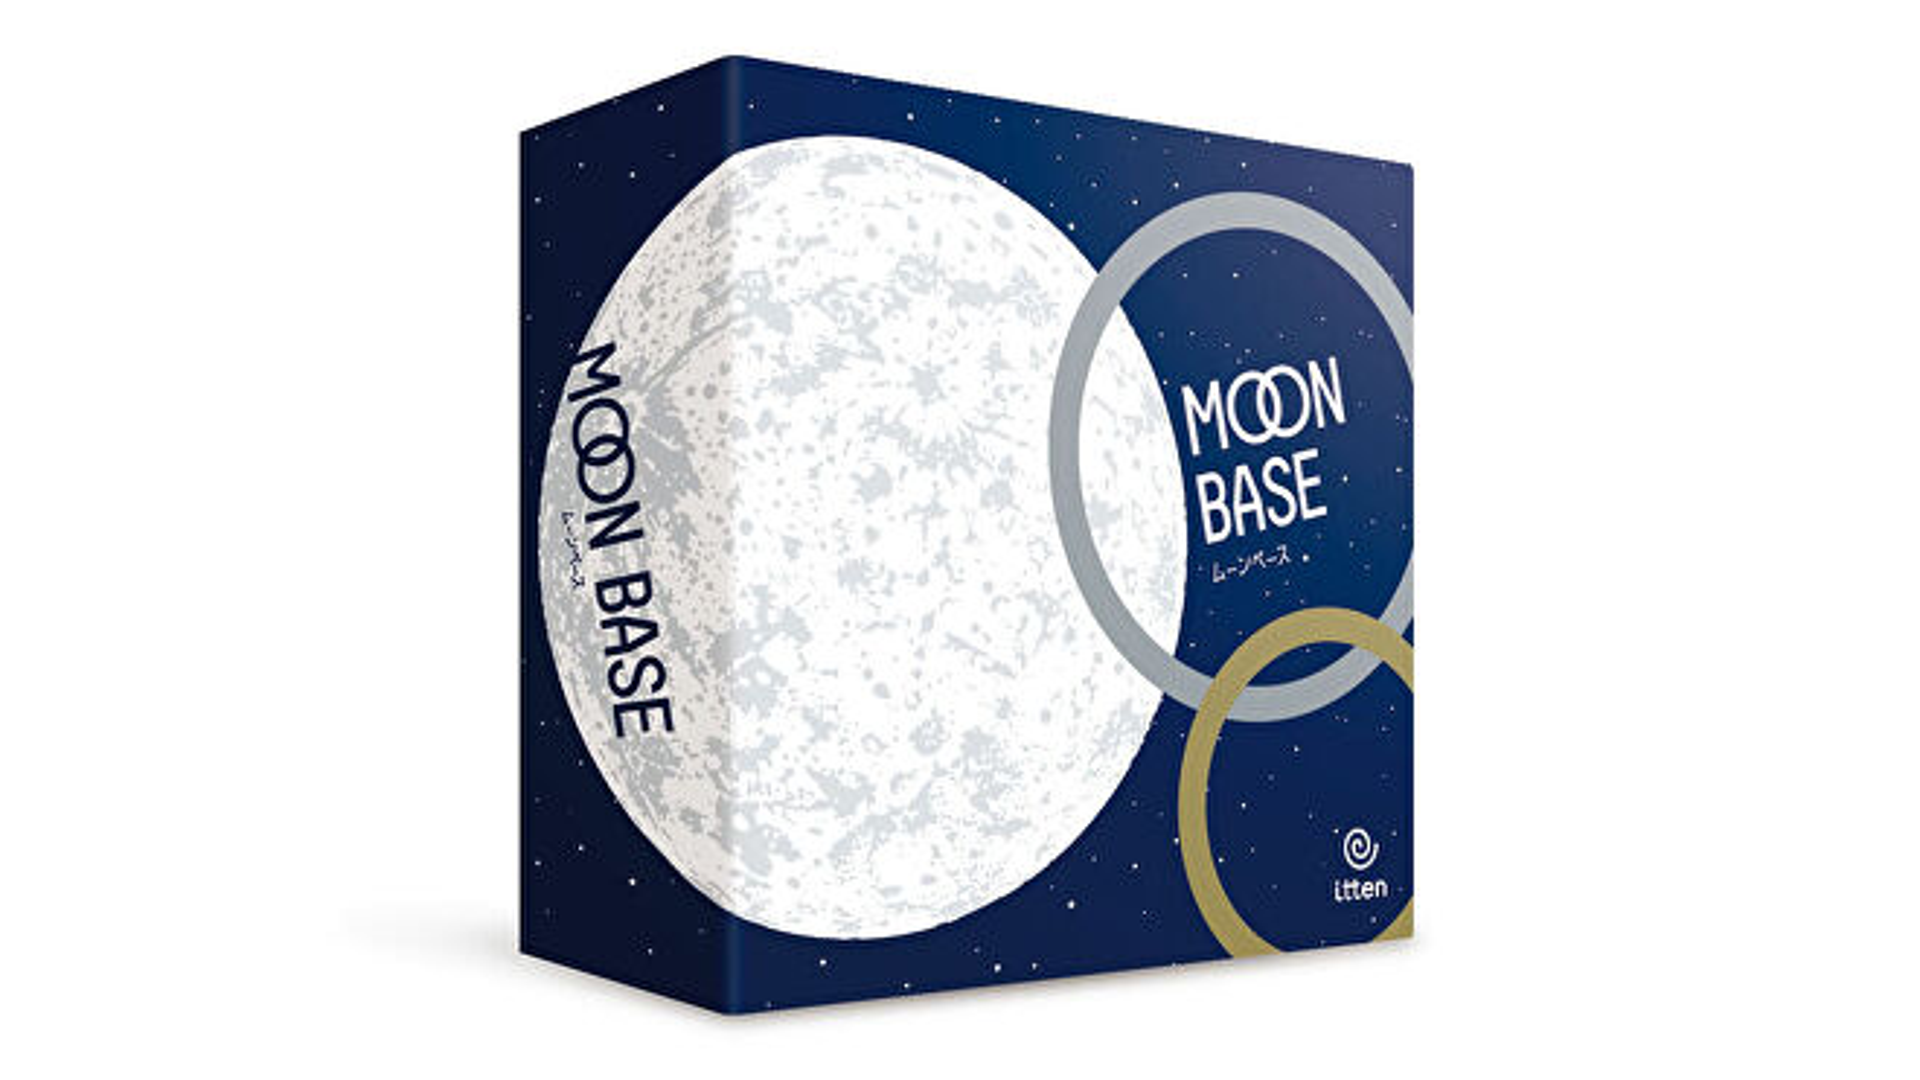 Photograph of the Moon Base box